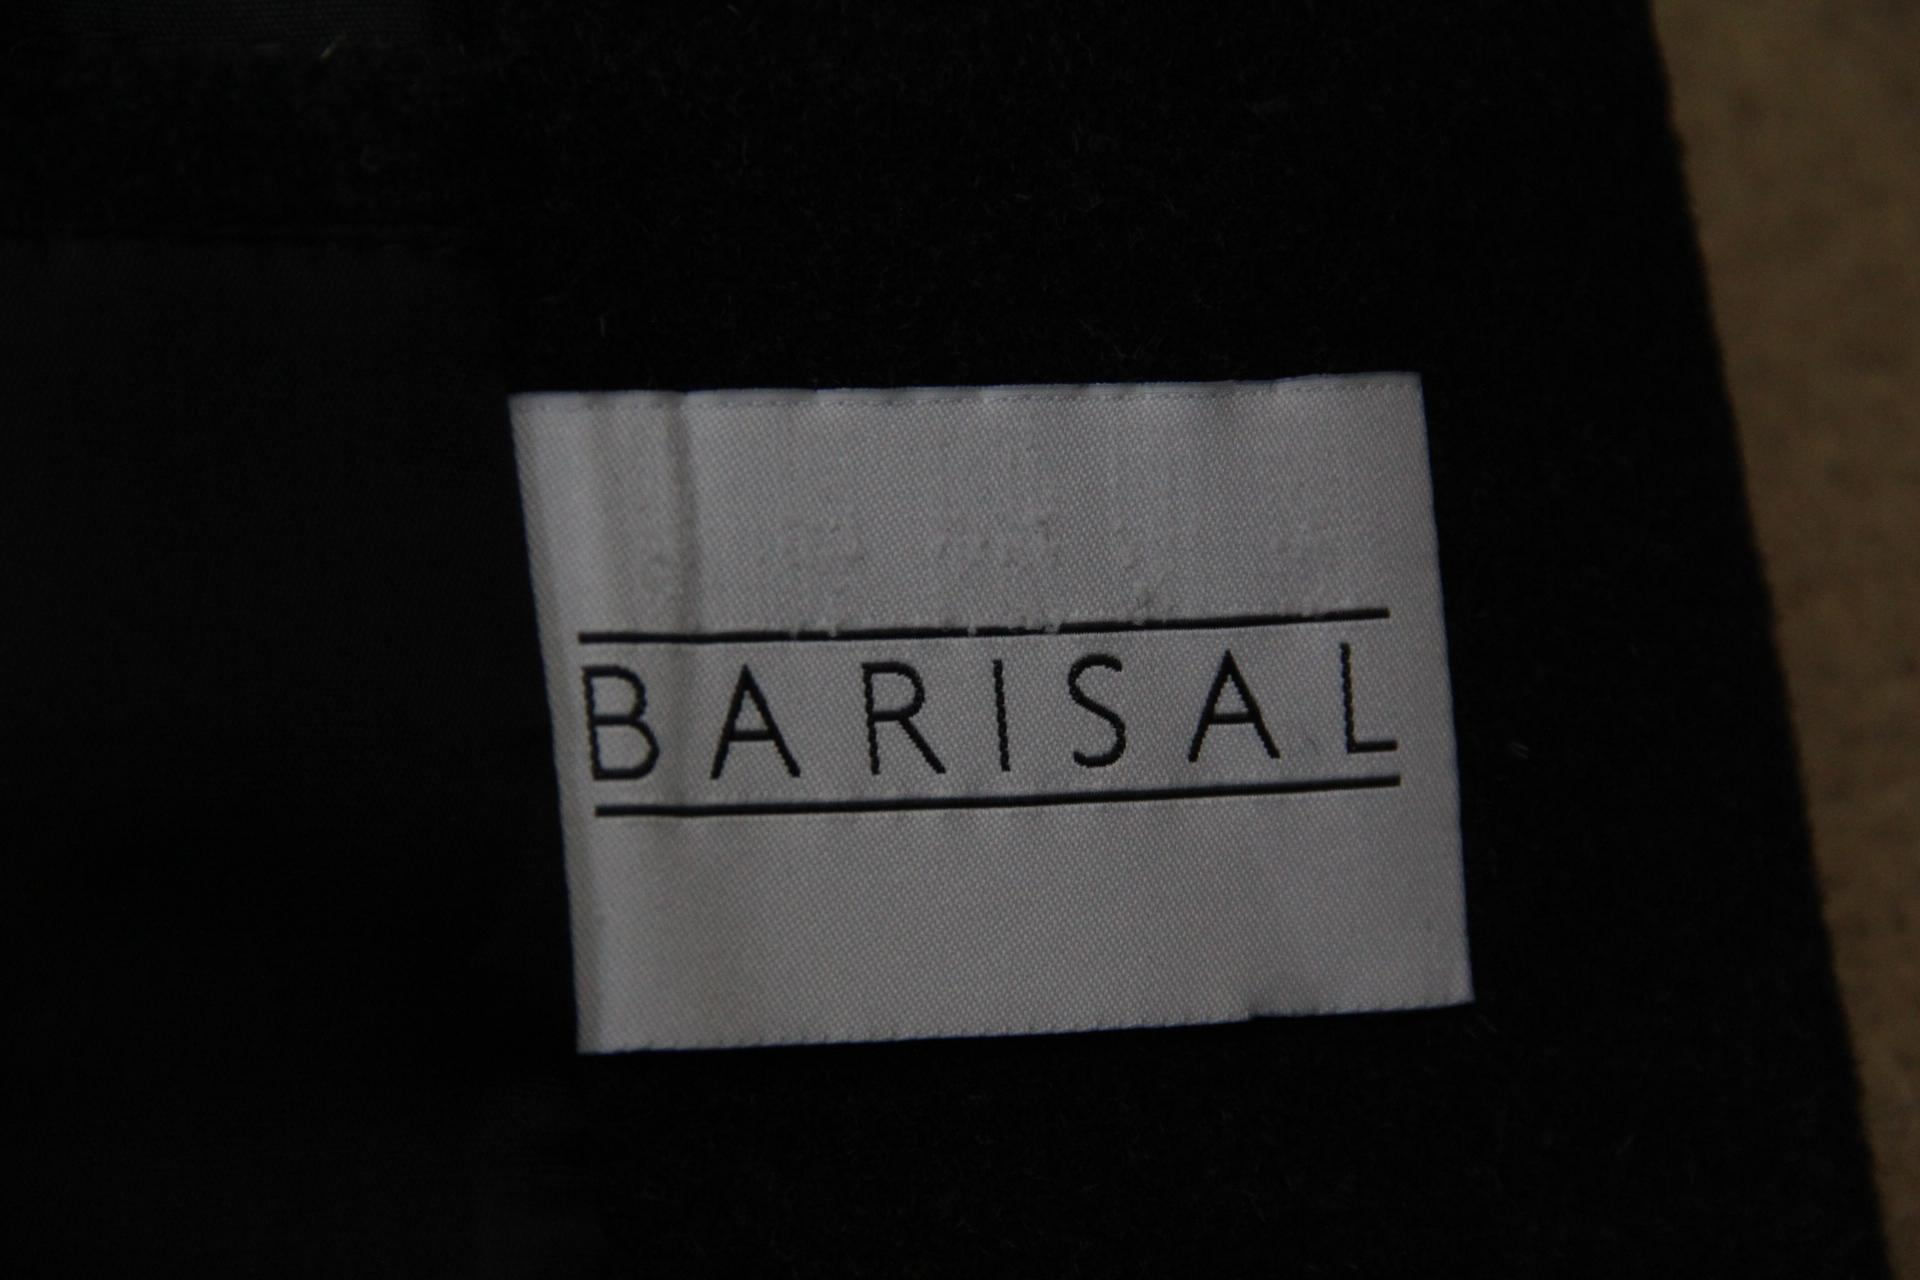 Barisal mantel